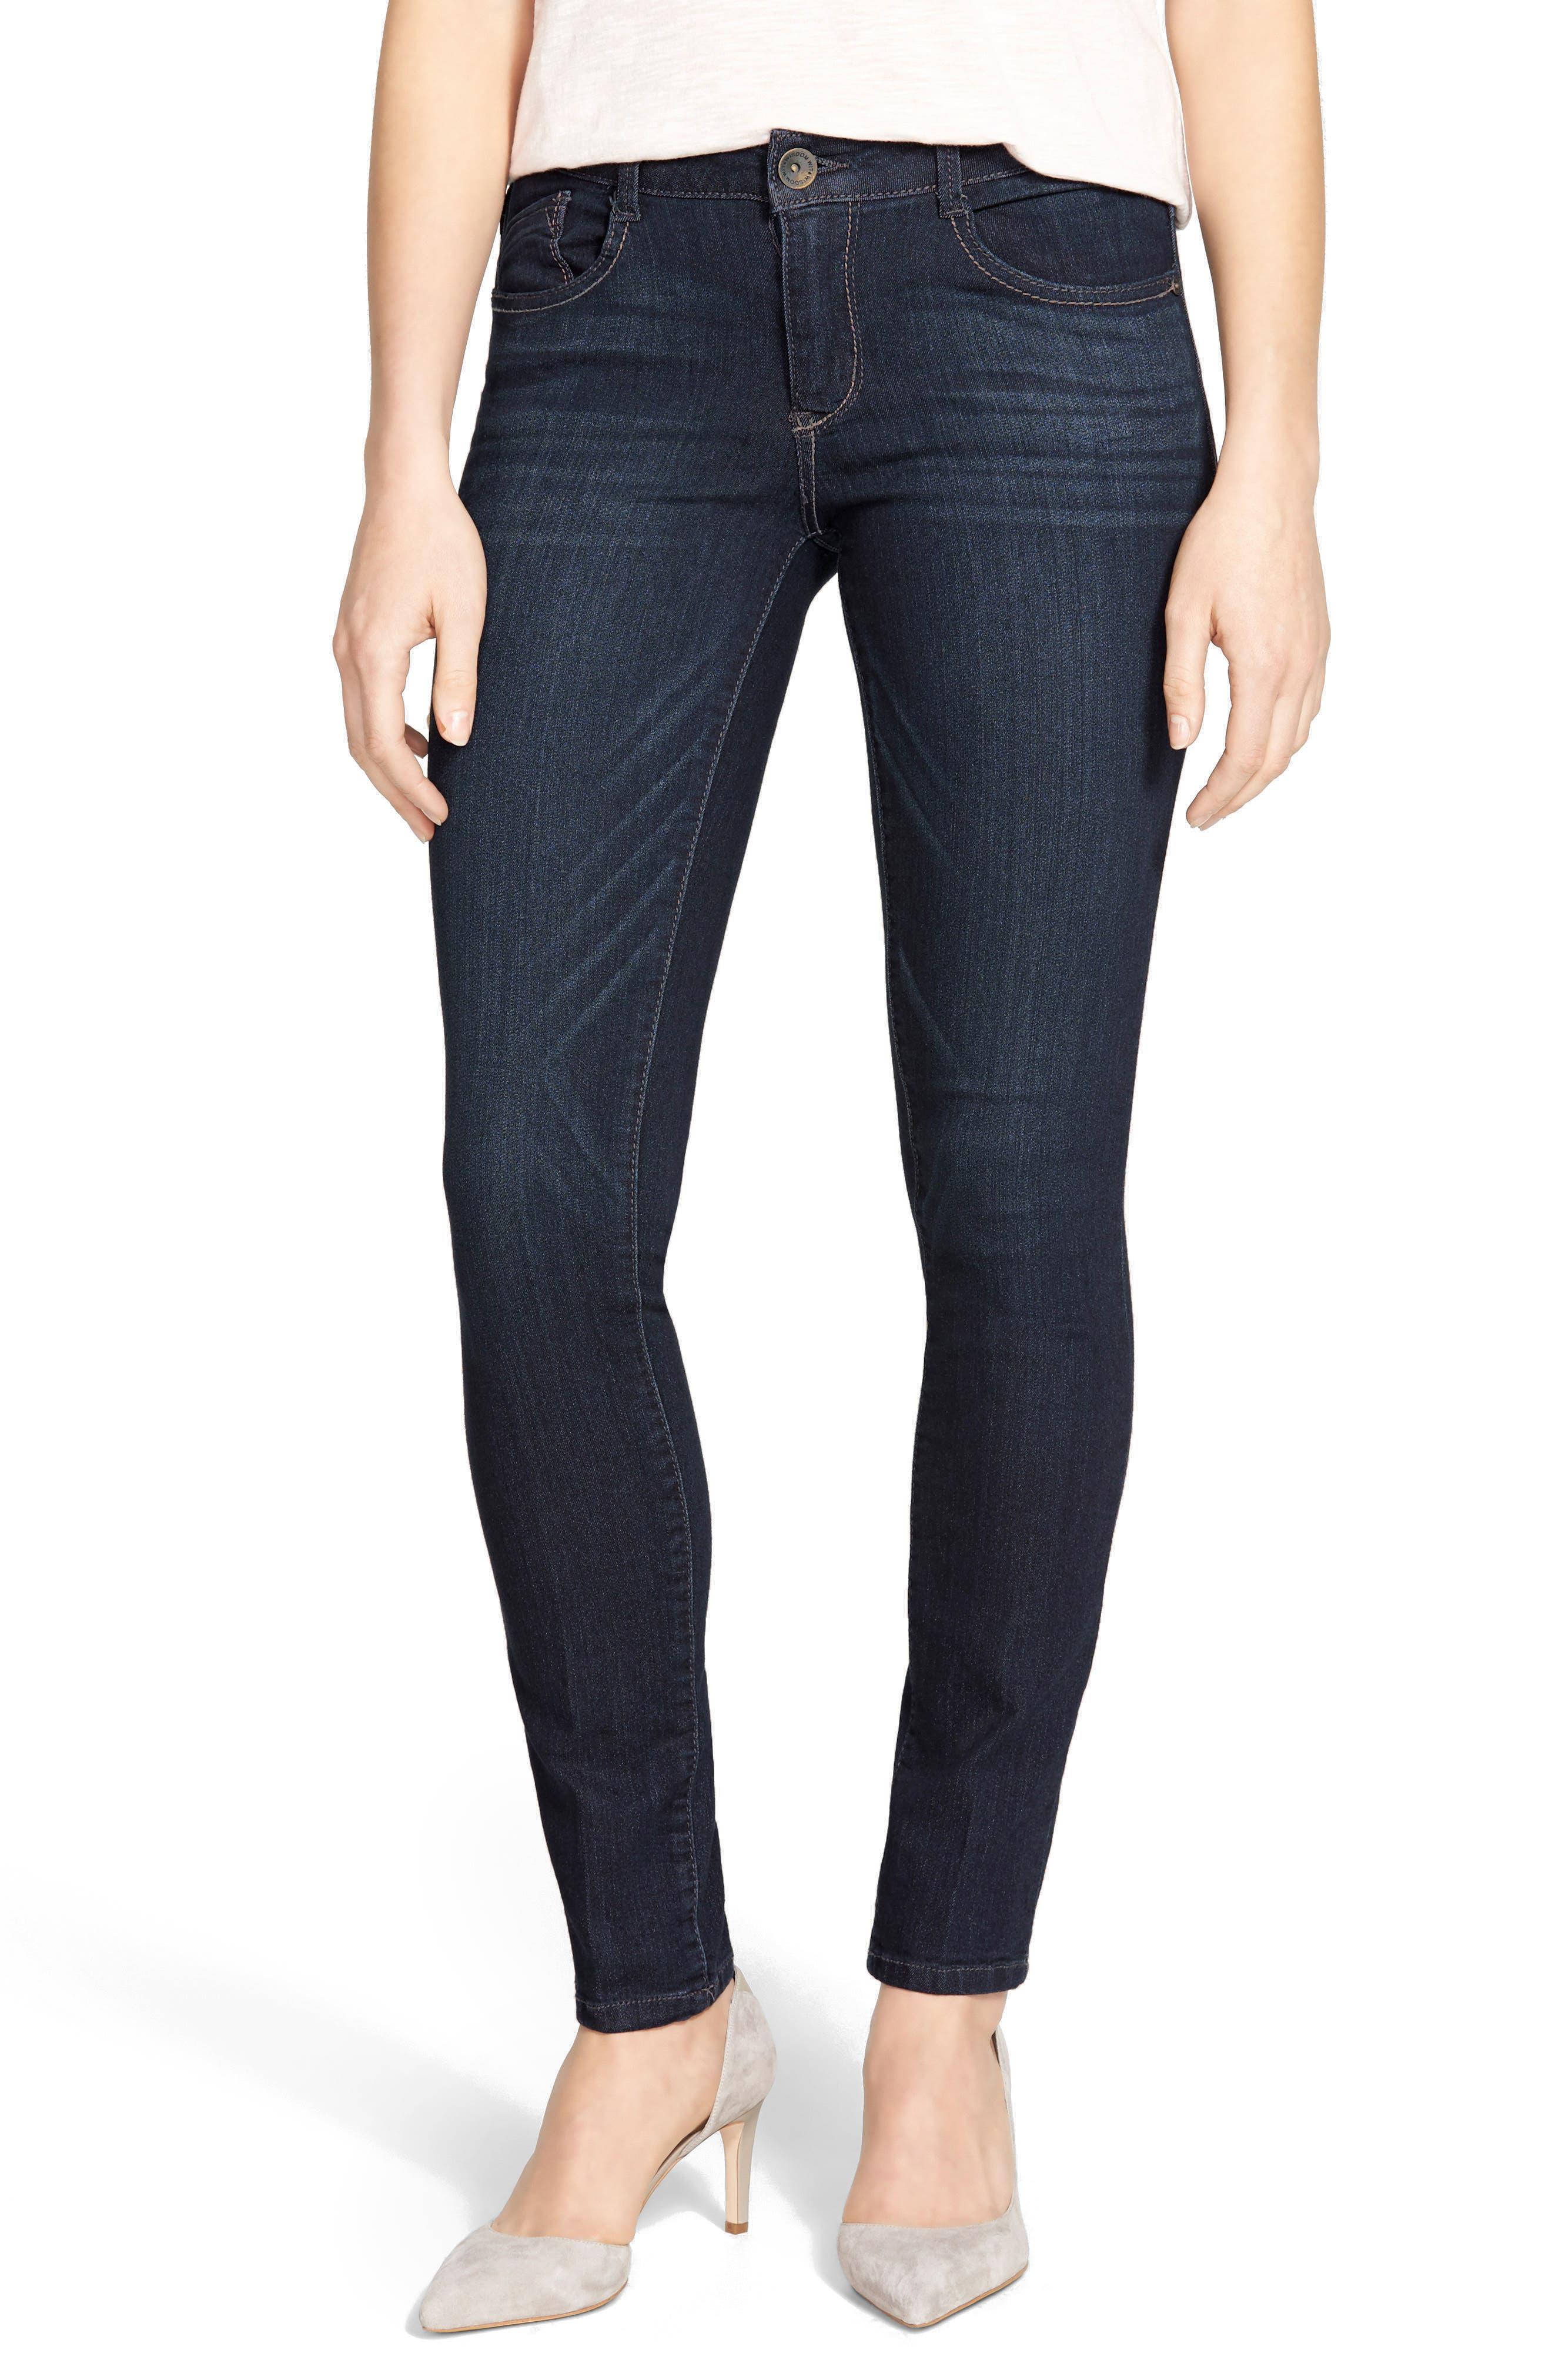 WIT & WISDOM Super Smooth Stretch Denim Skinny Jeans, Main, color, DARK NAVY